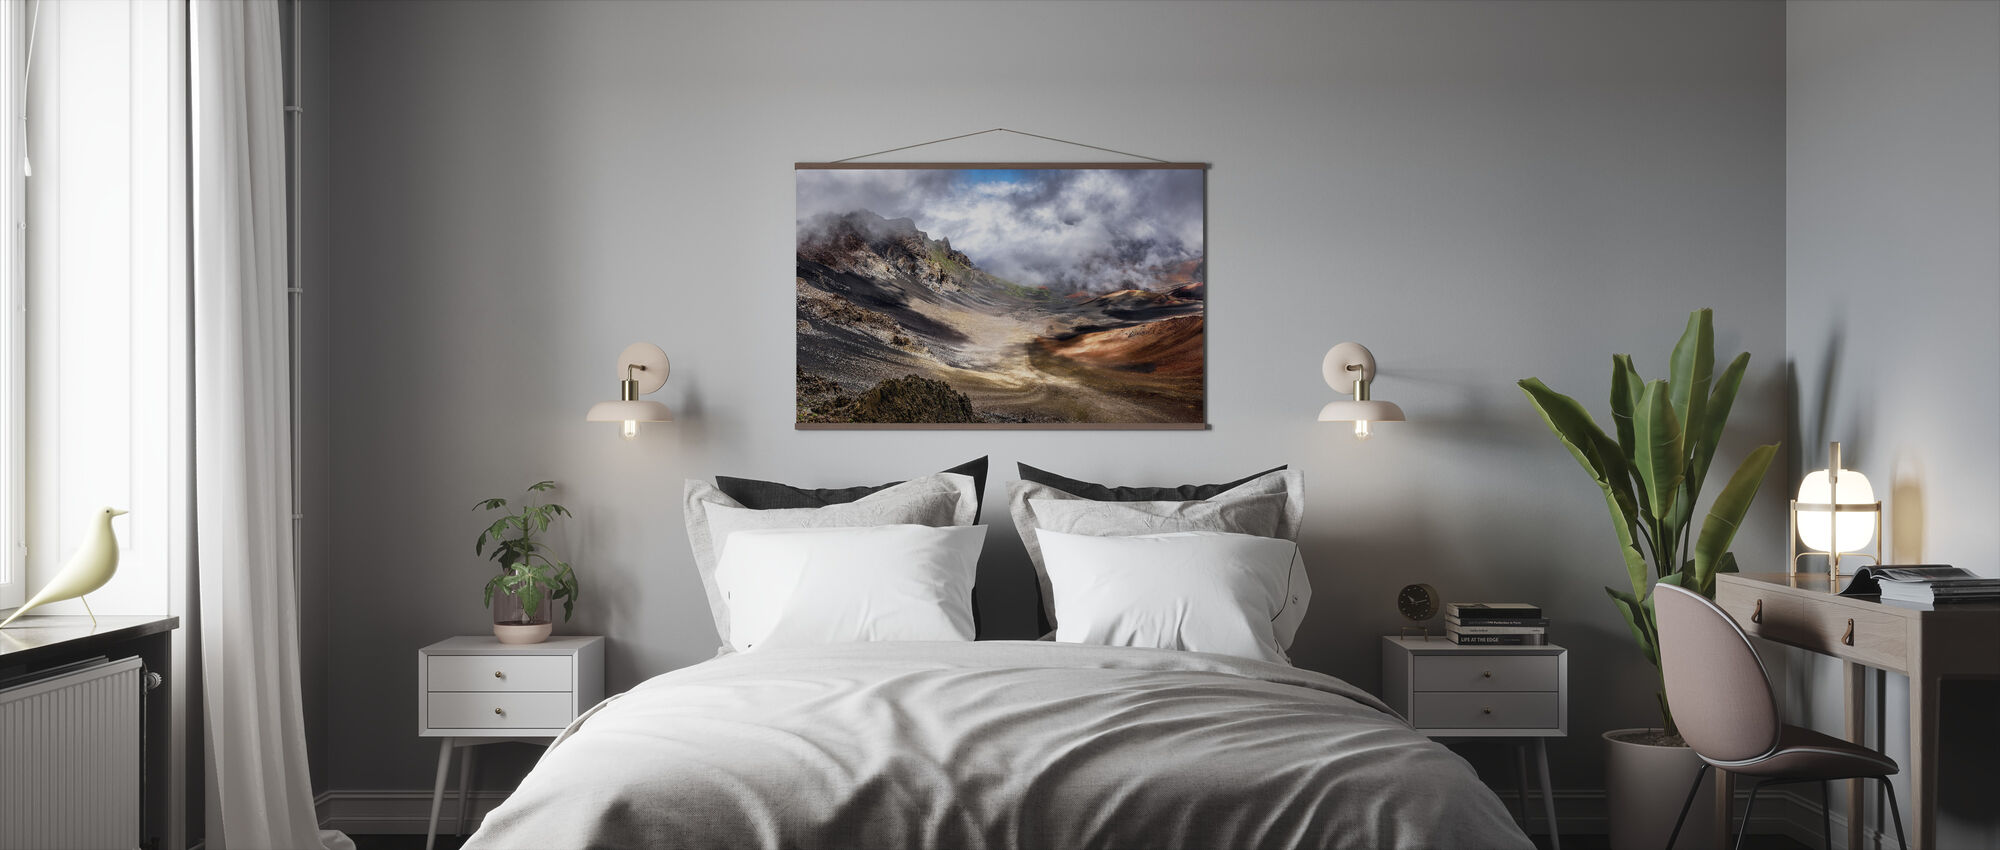 Craters Edge - Poster - Bedroom